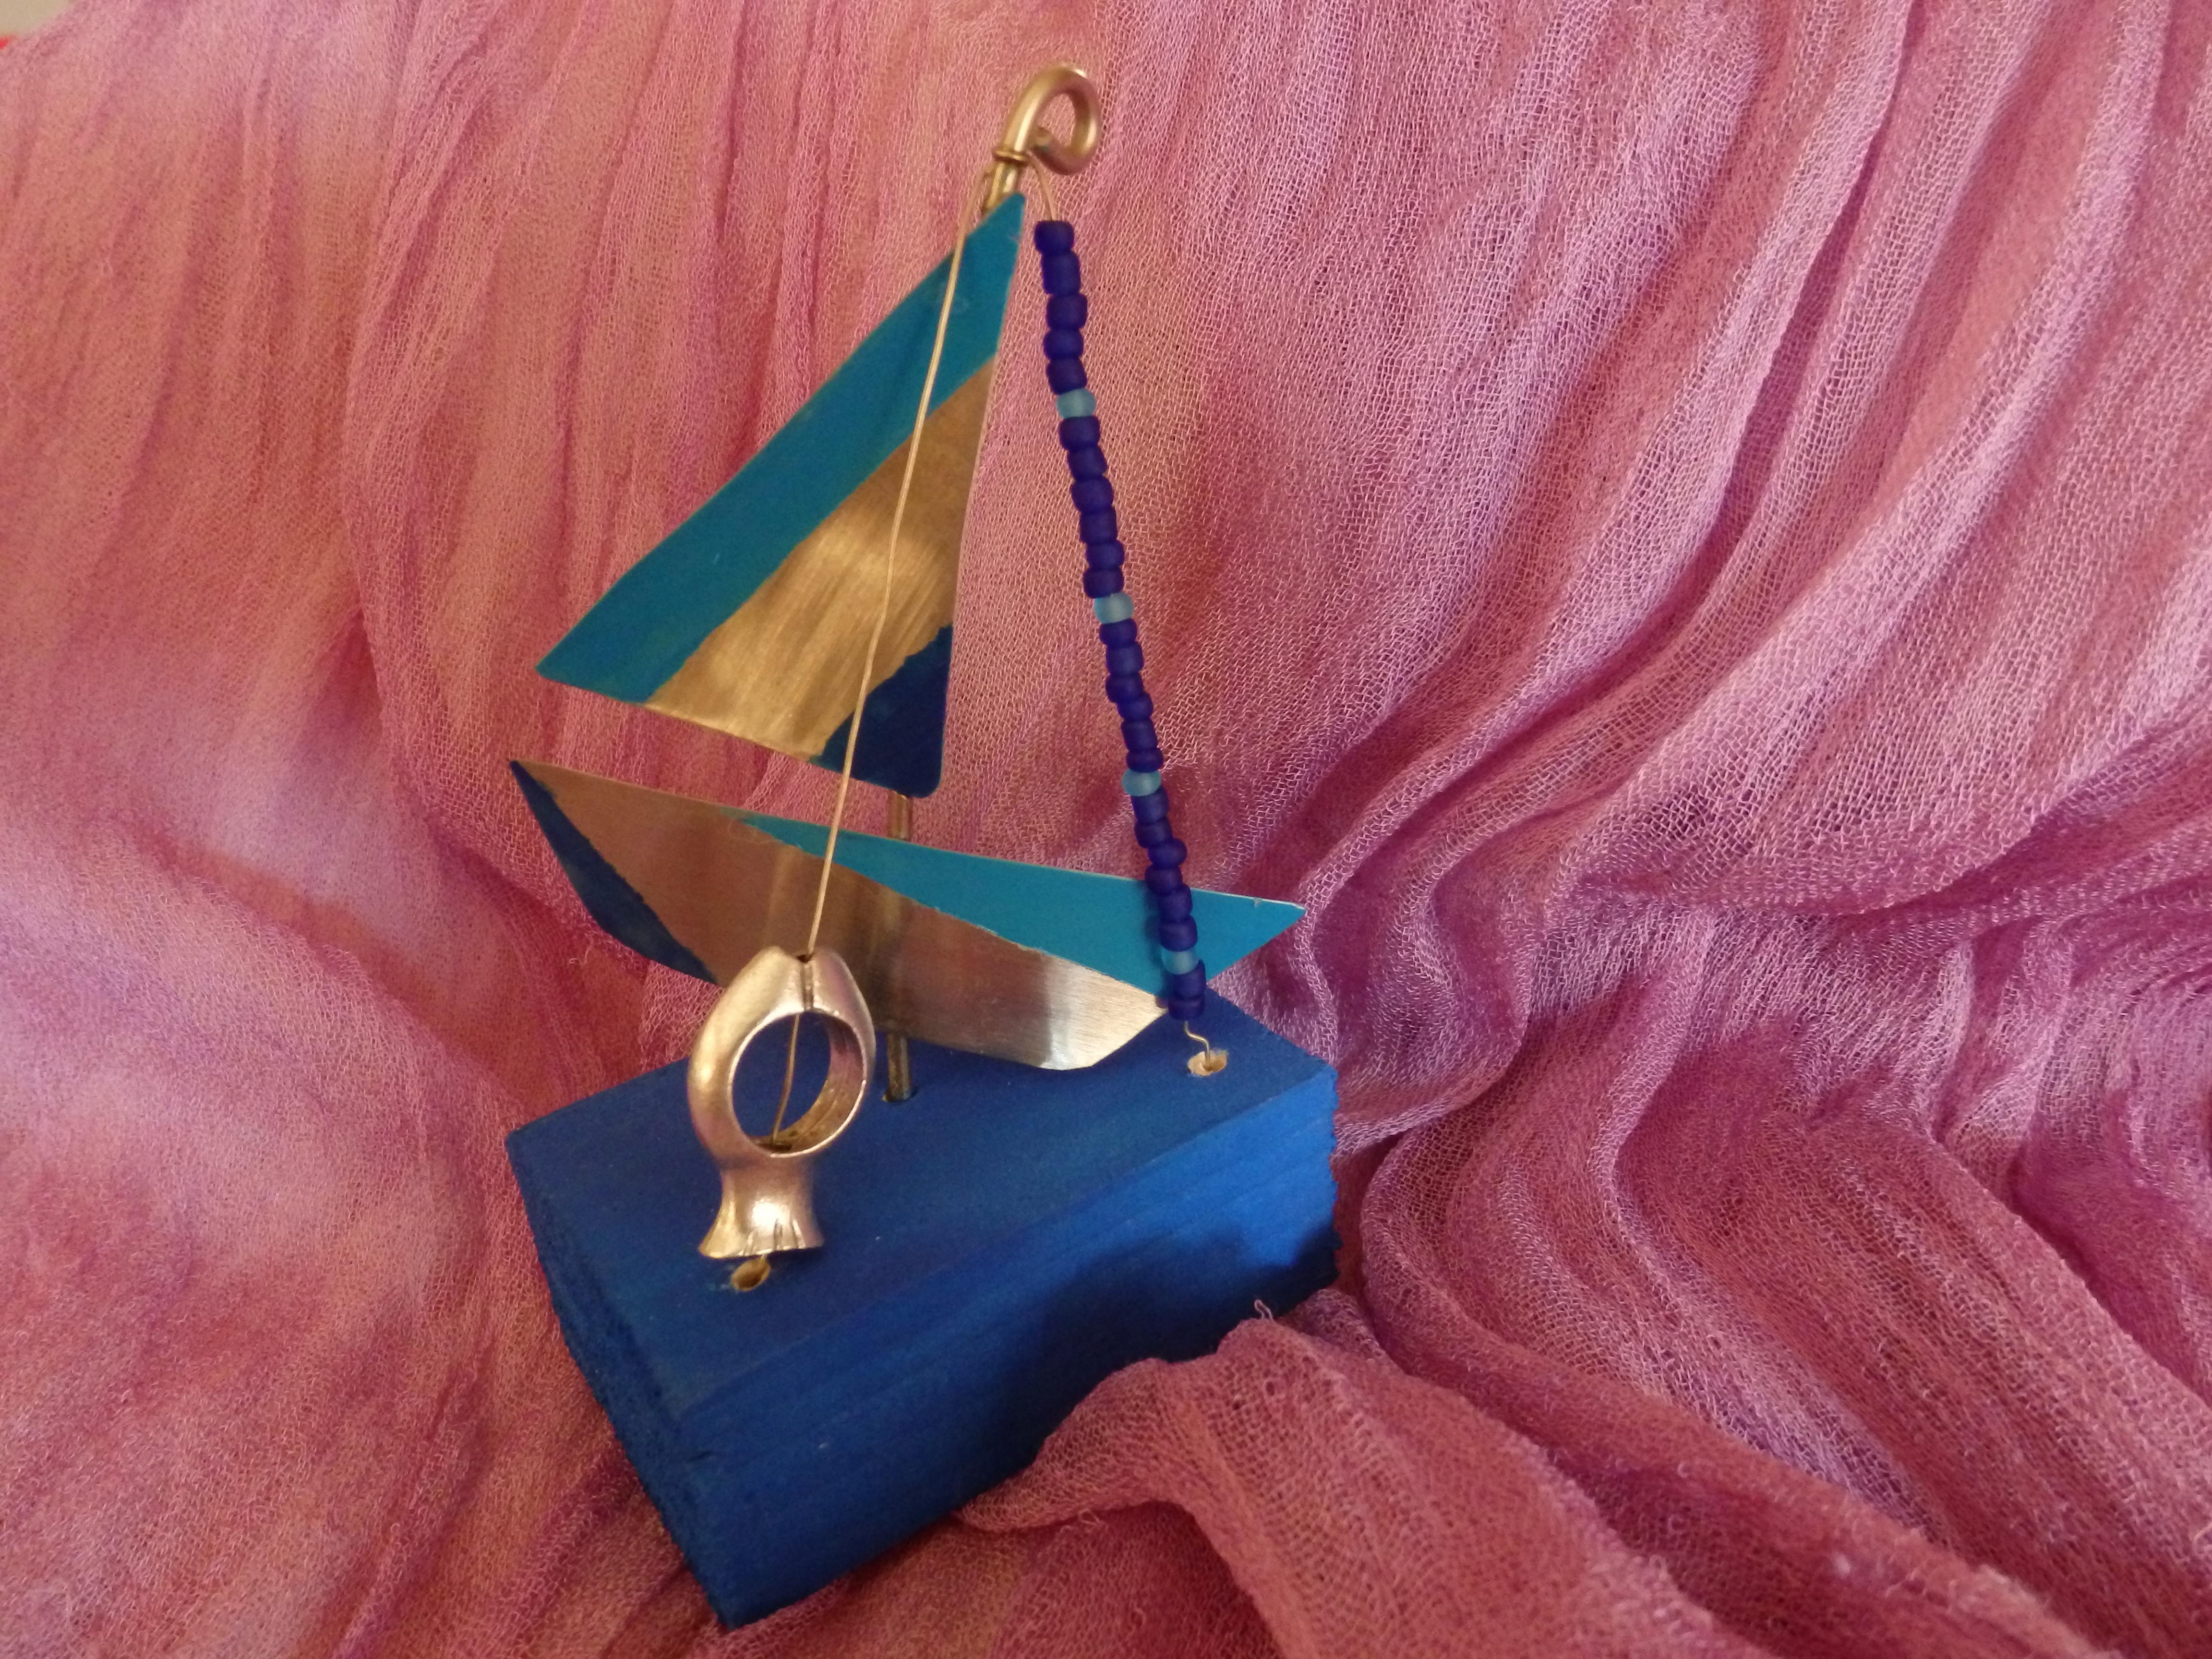 Handmade boat ornament